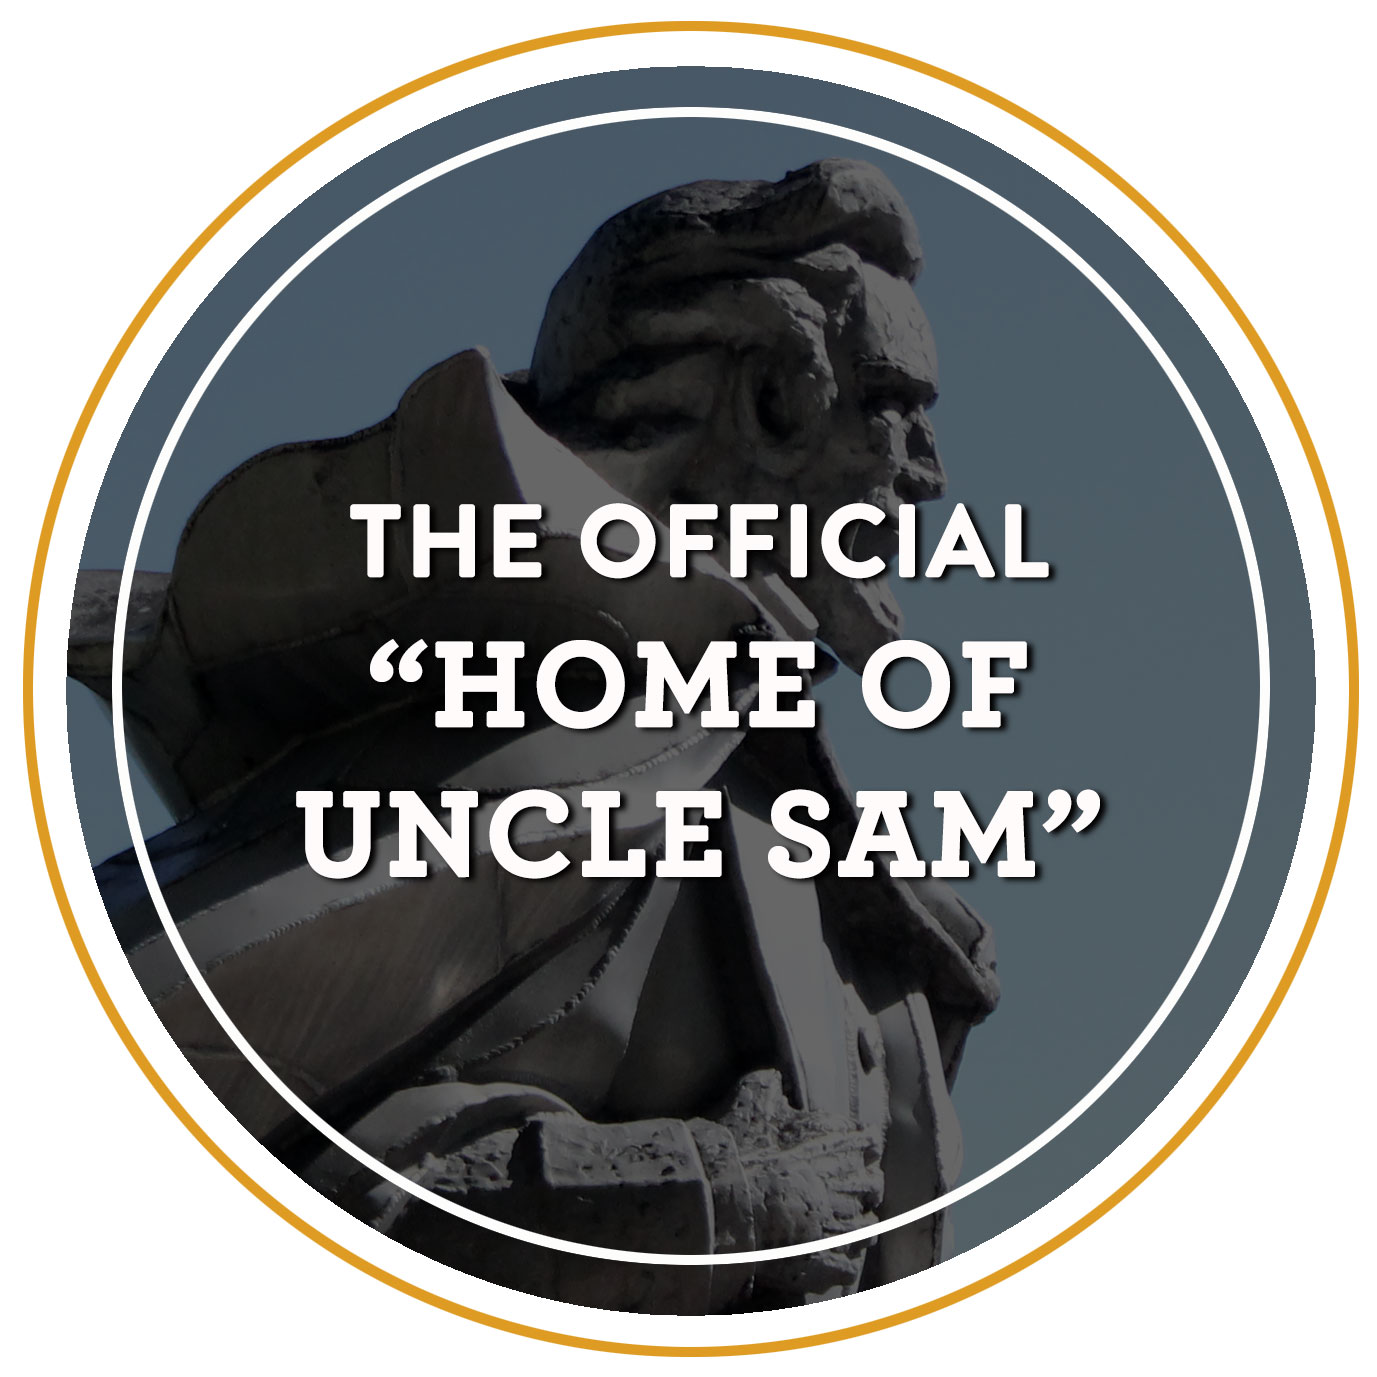 unclesamtroy.jpg